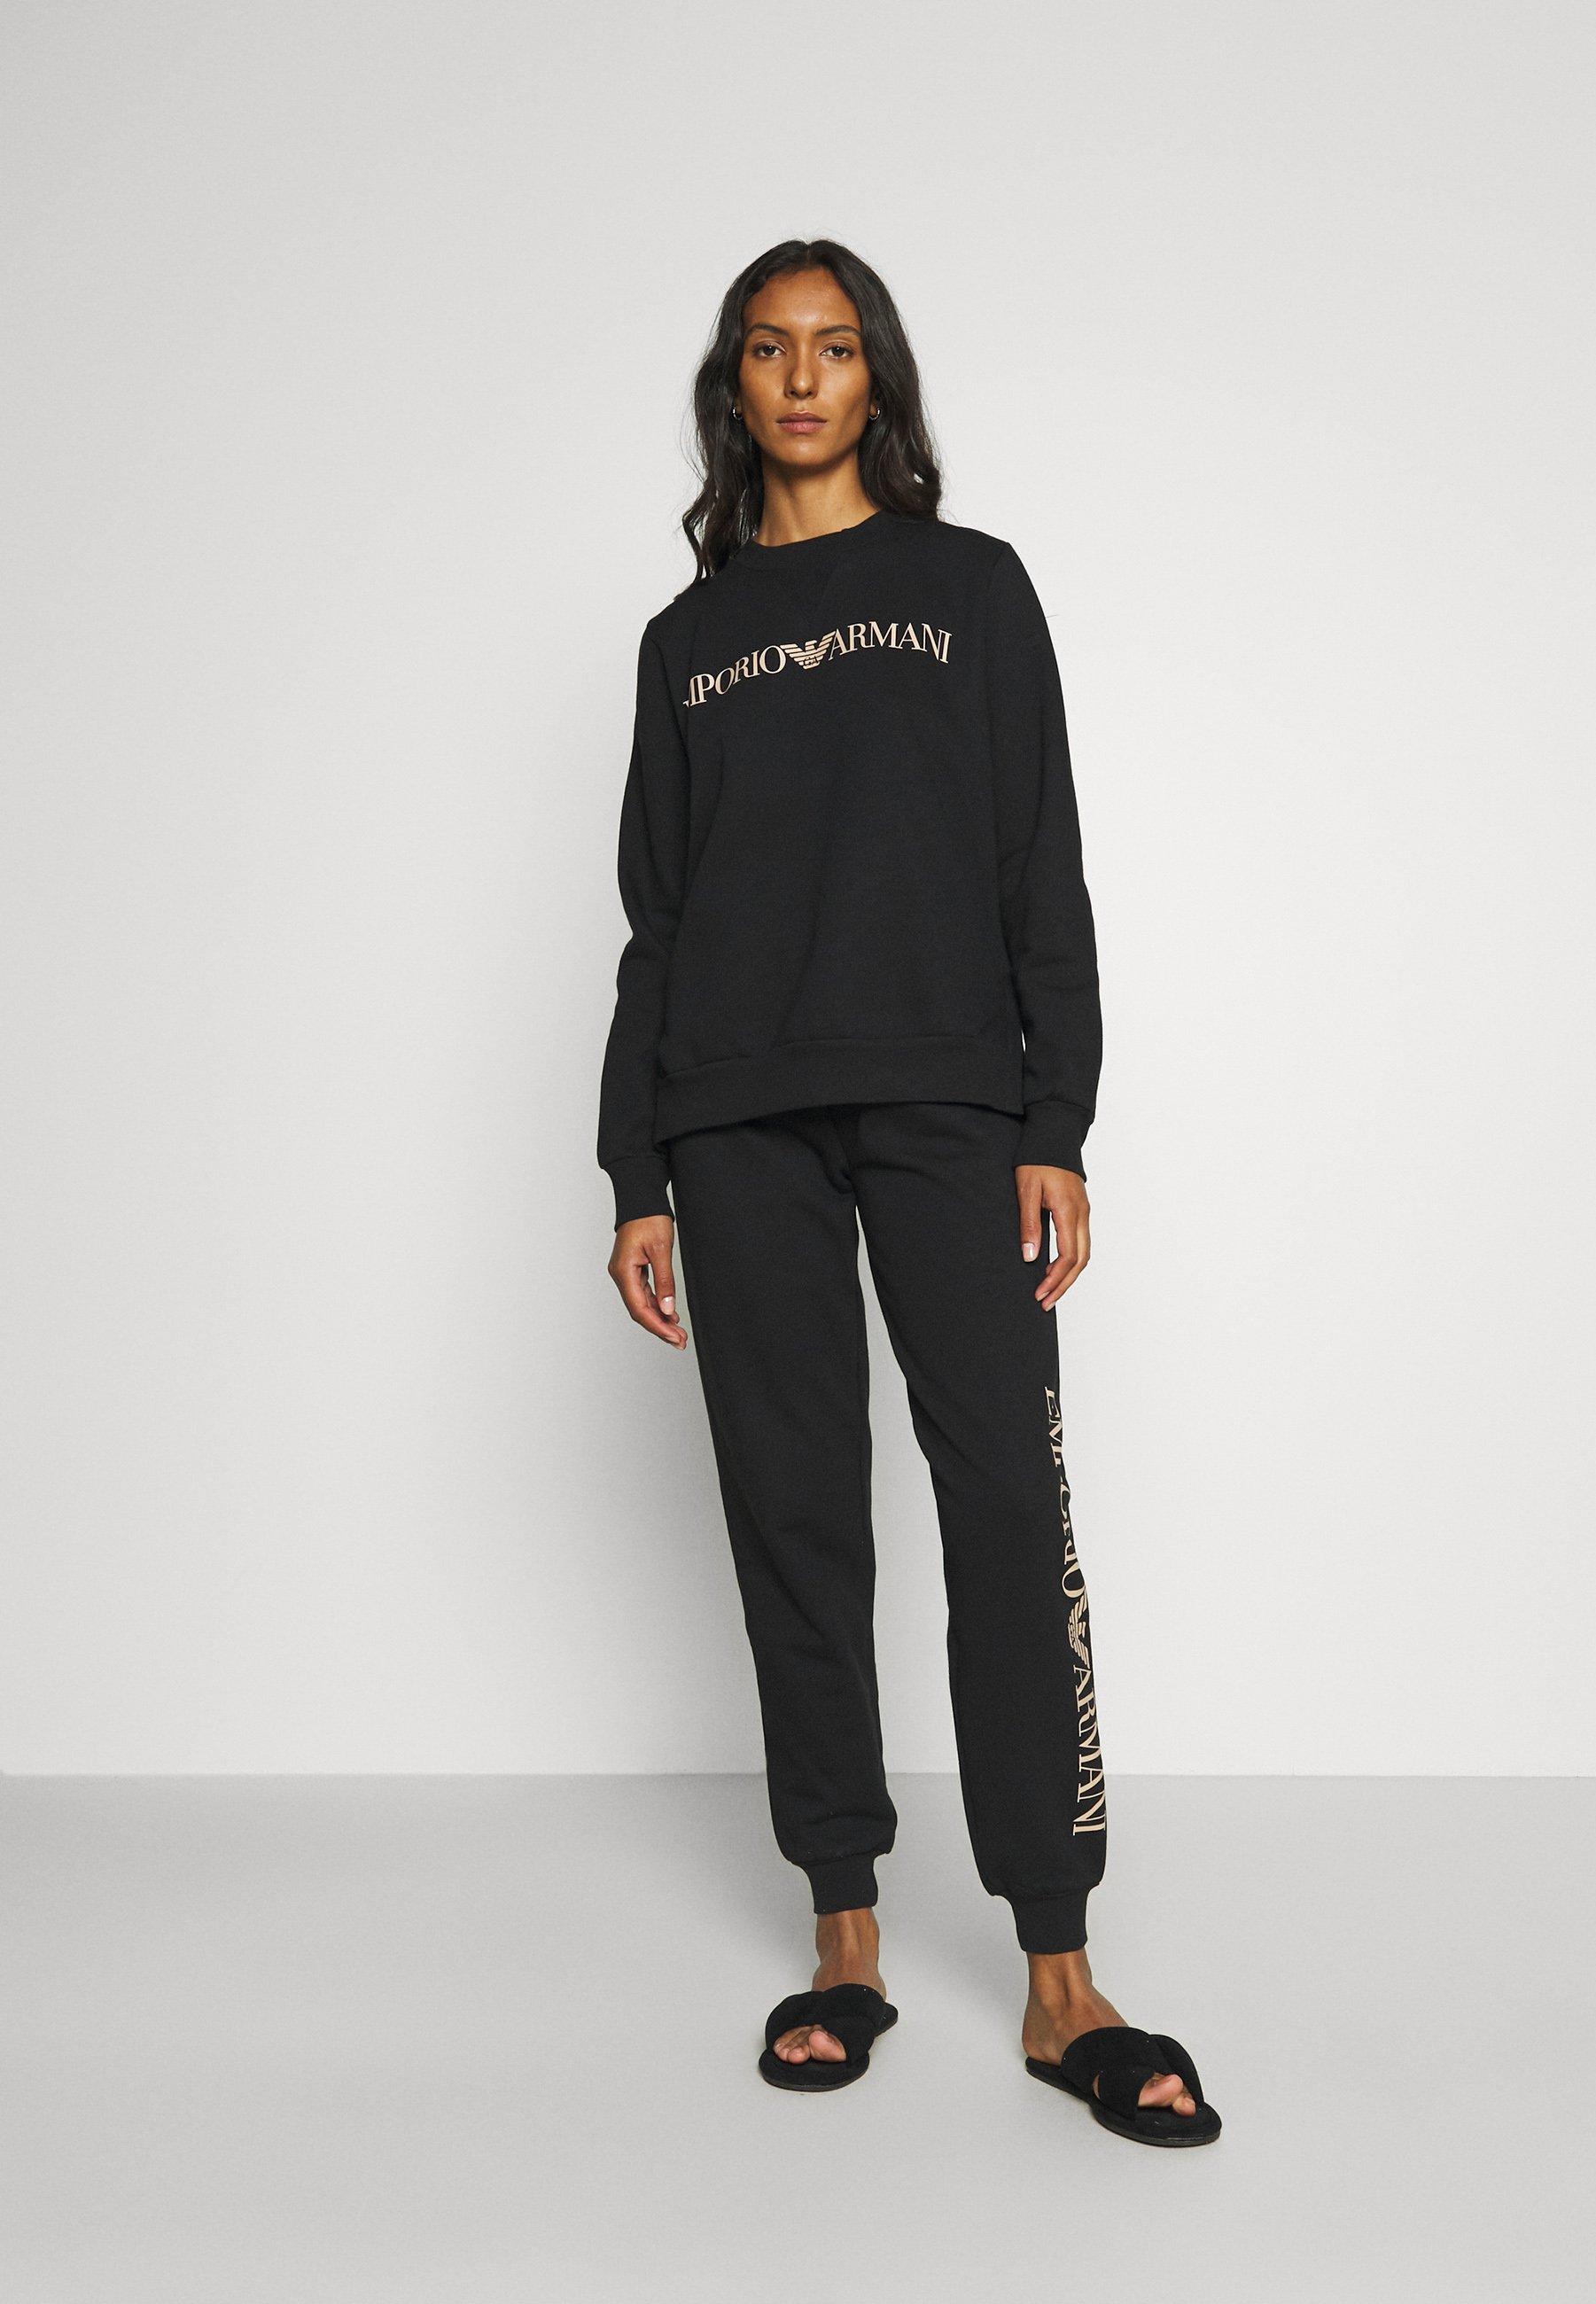 Damen ICONIC TERRY SWEATER PANTS SET - Pyjama